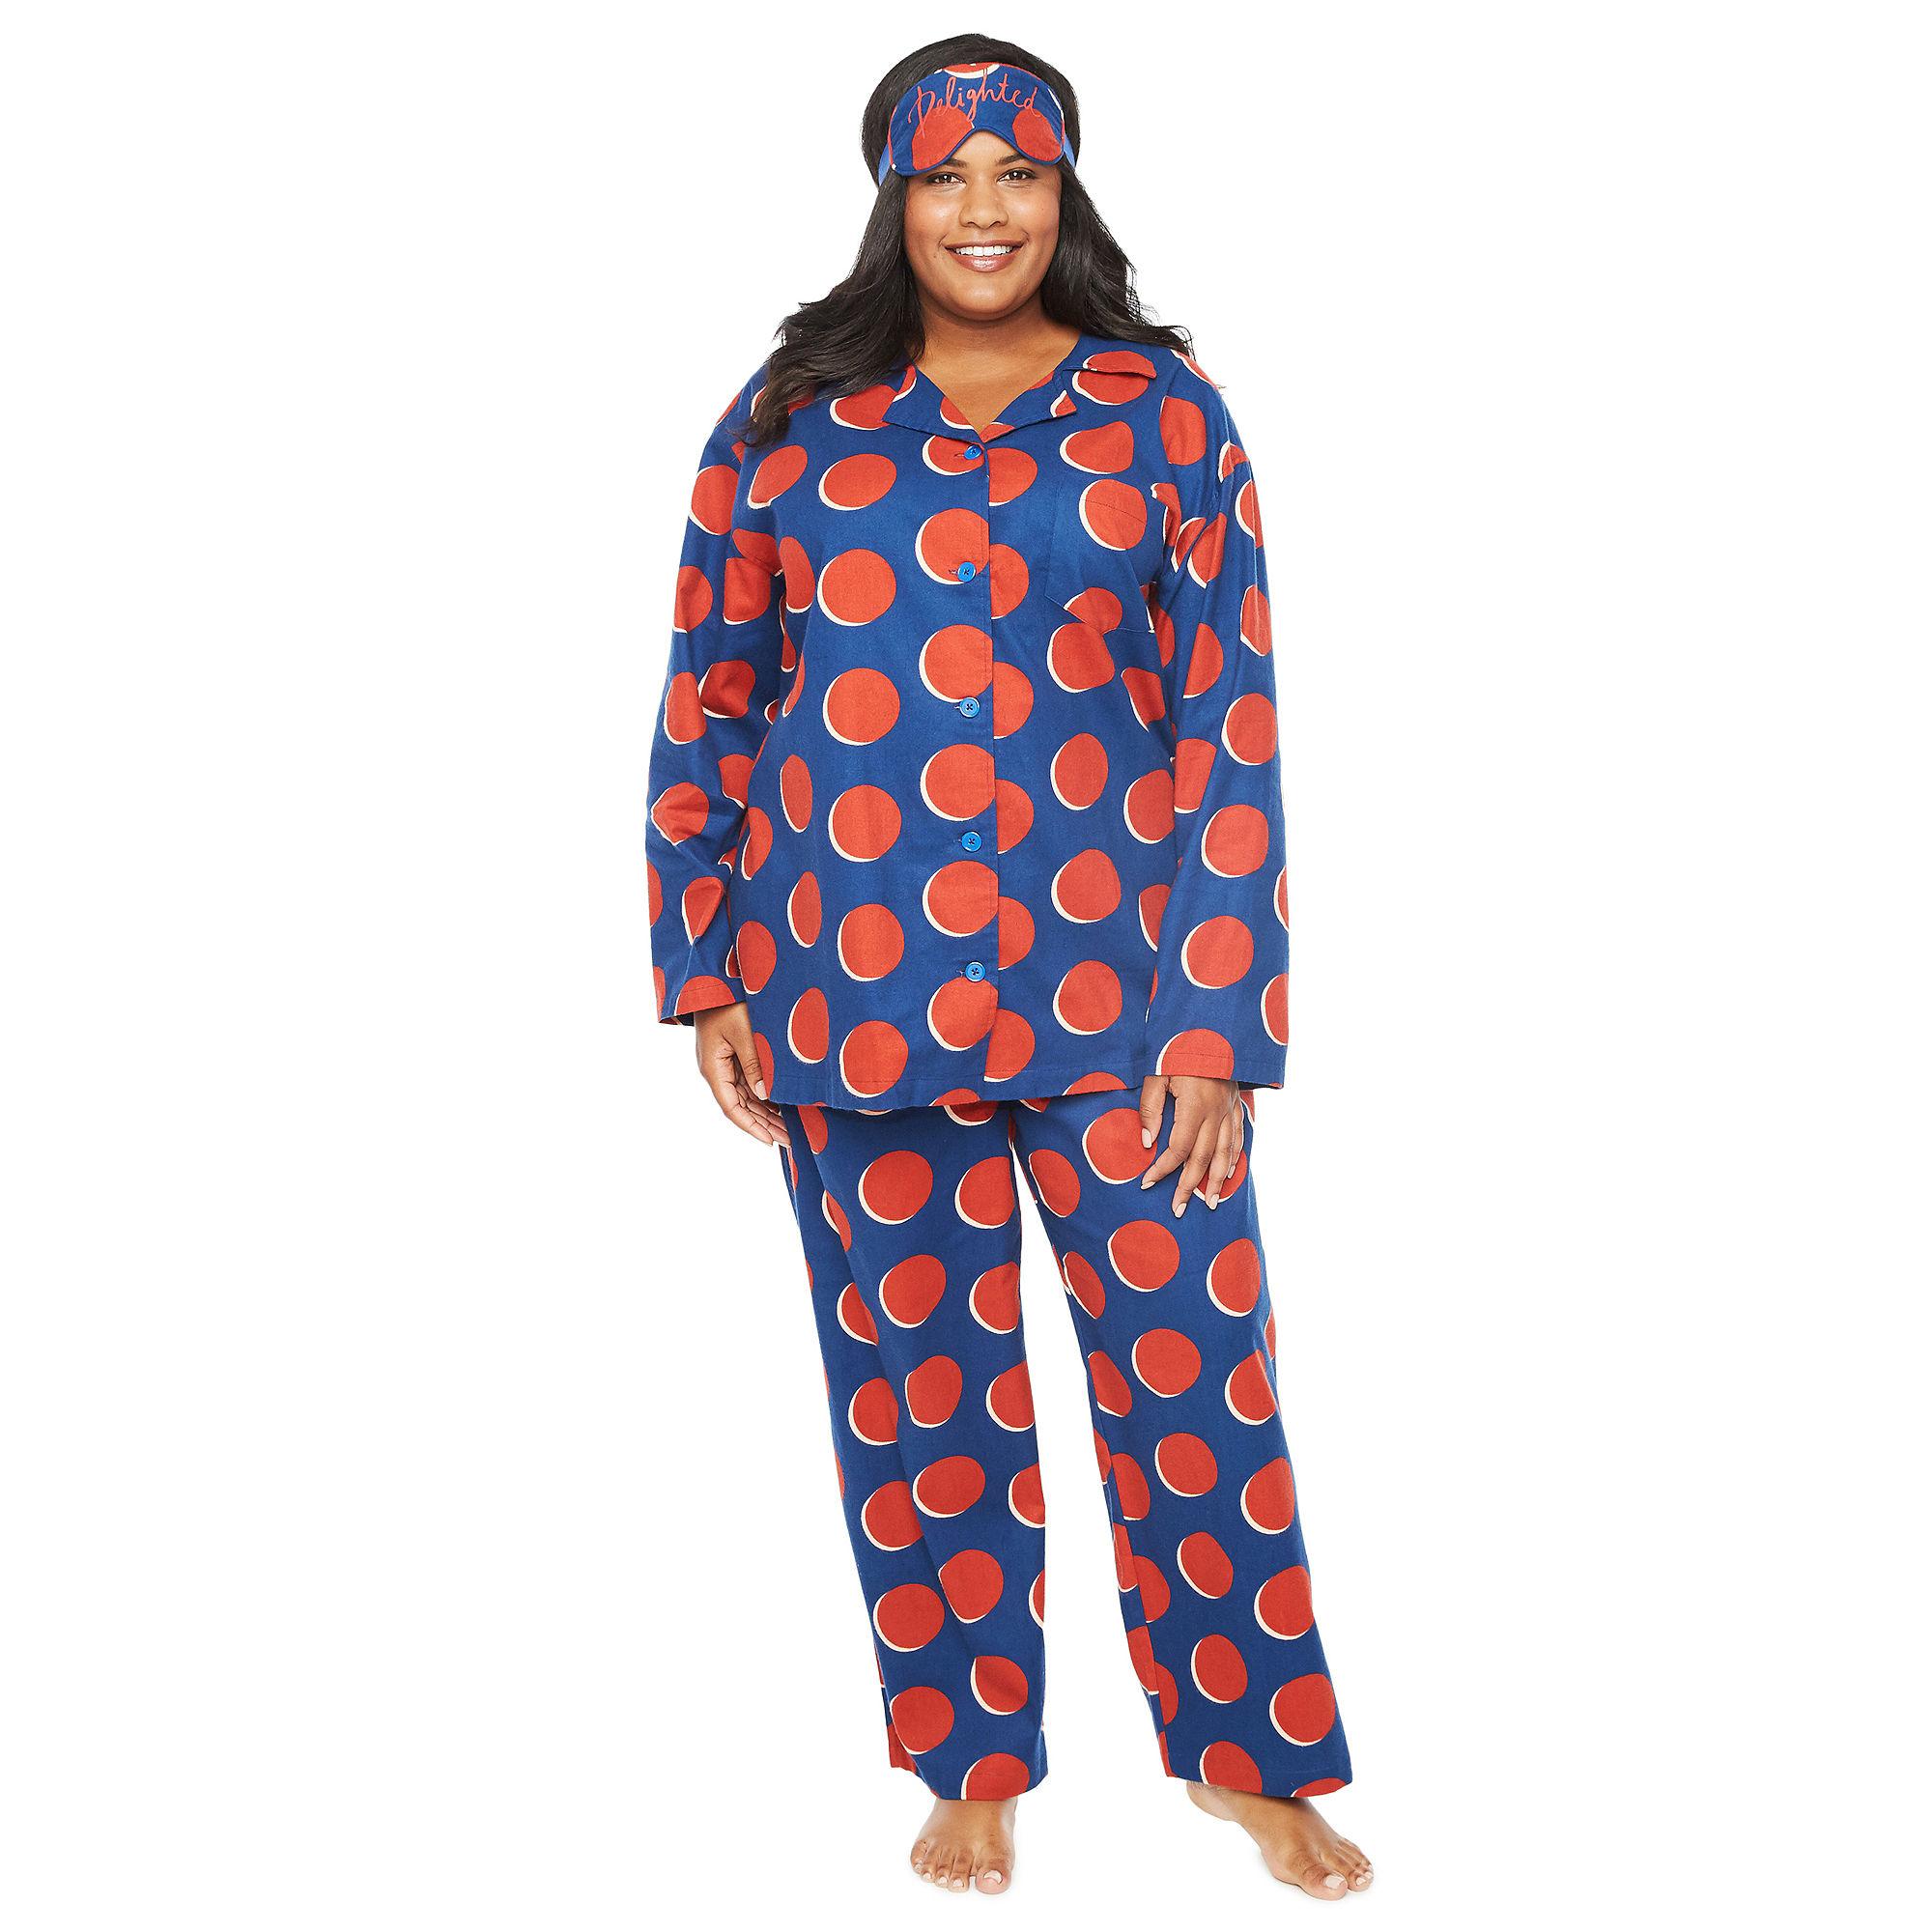 ef47248f711 Tracee Ellis Ross for JCP Pant Pajama Set with Eyemask